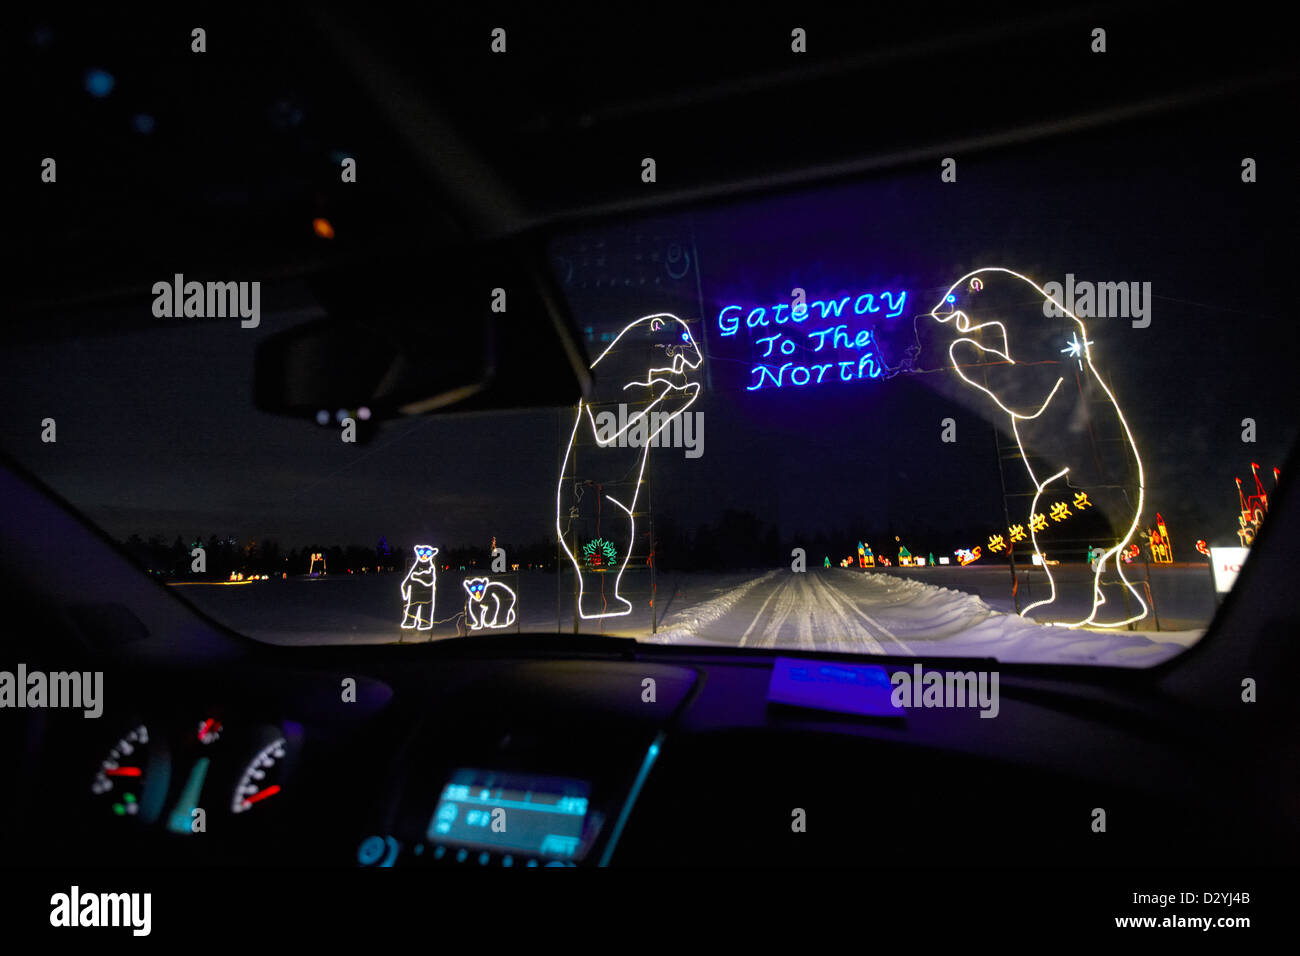 driving through illuminated enchanted forest attraction at night Saskatoon Saskatchewan Canada - Stock Image